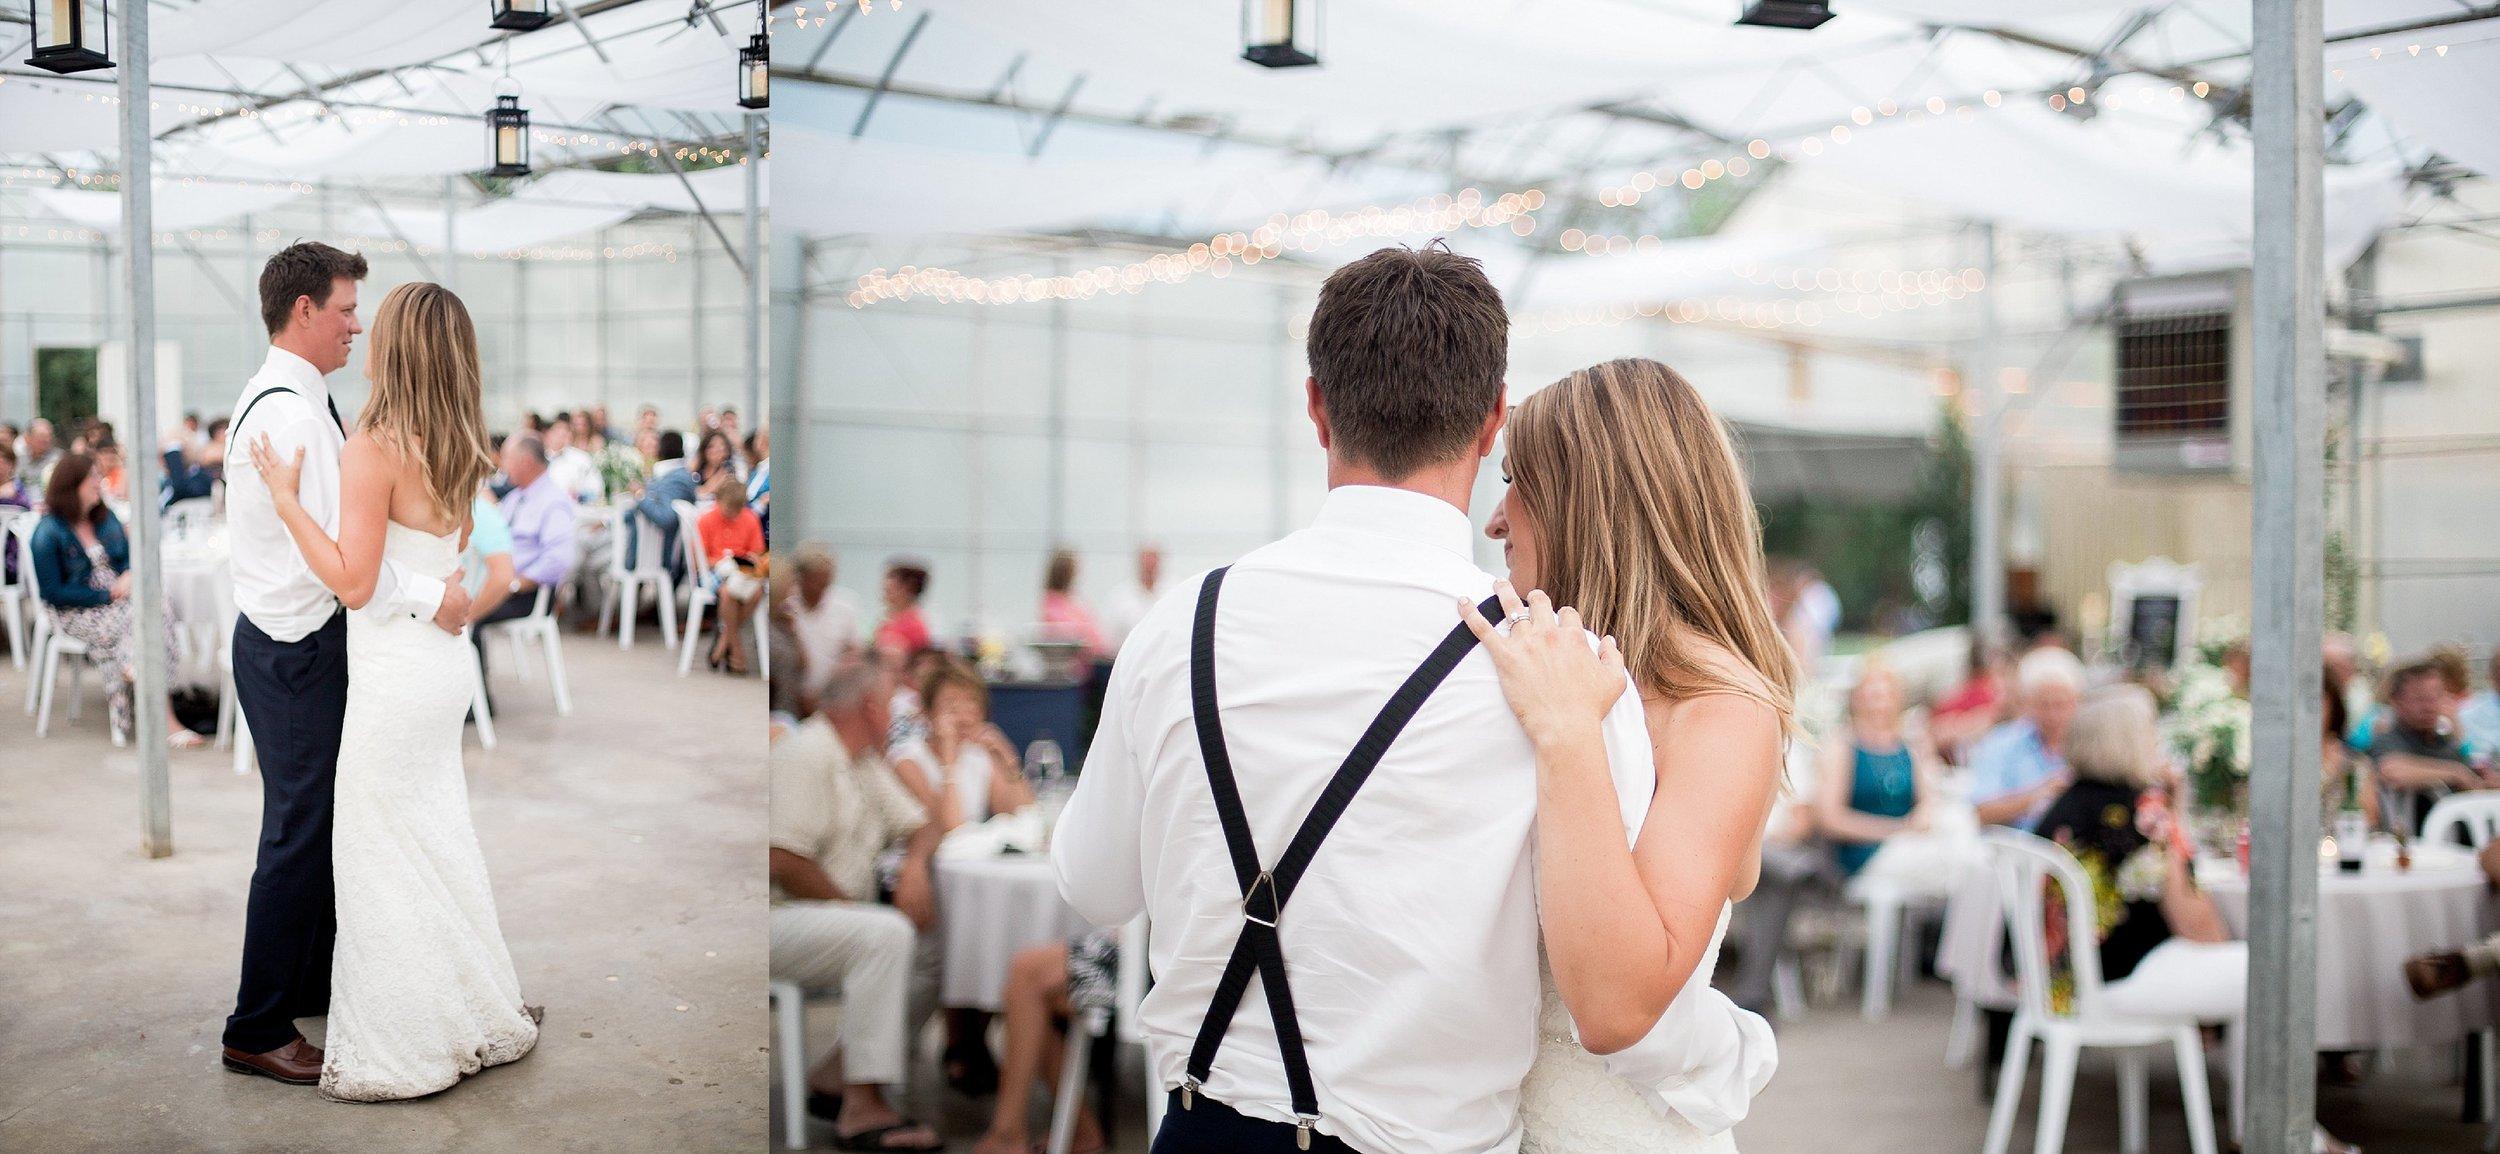 Greenhouse wedding reception   First dance photos  Keila Marie Photography   Toronto Wedding Photographer